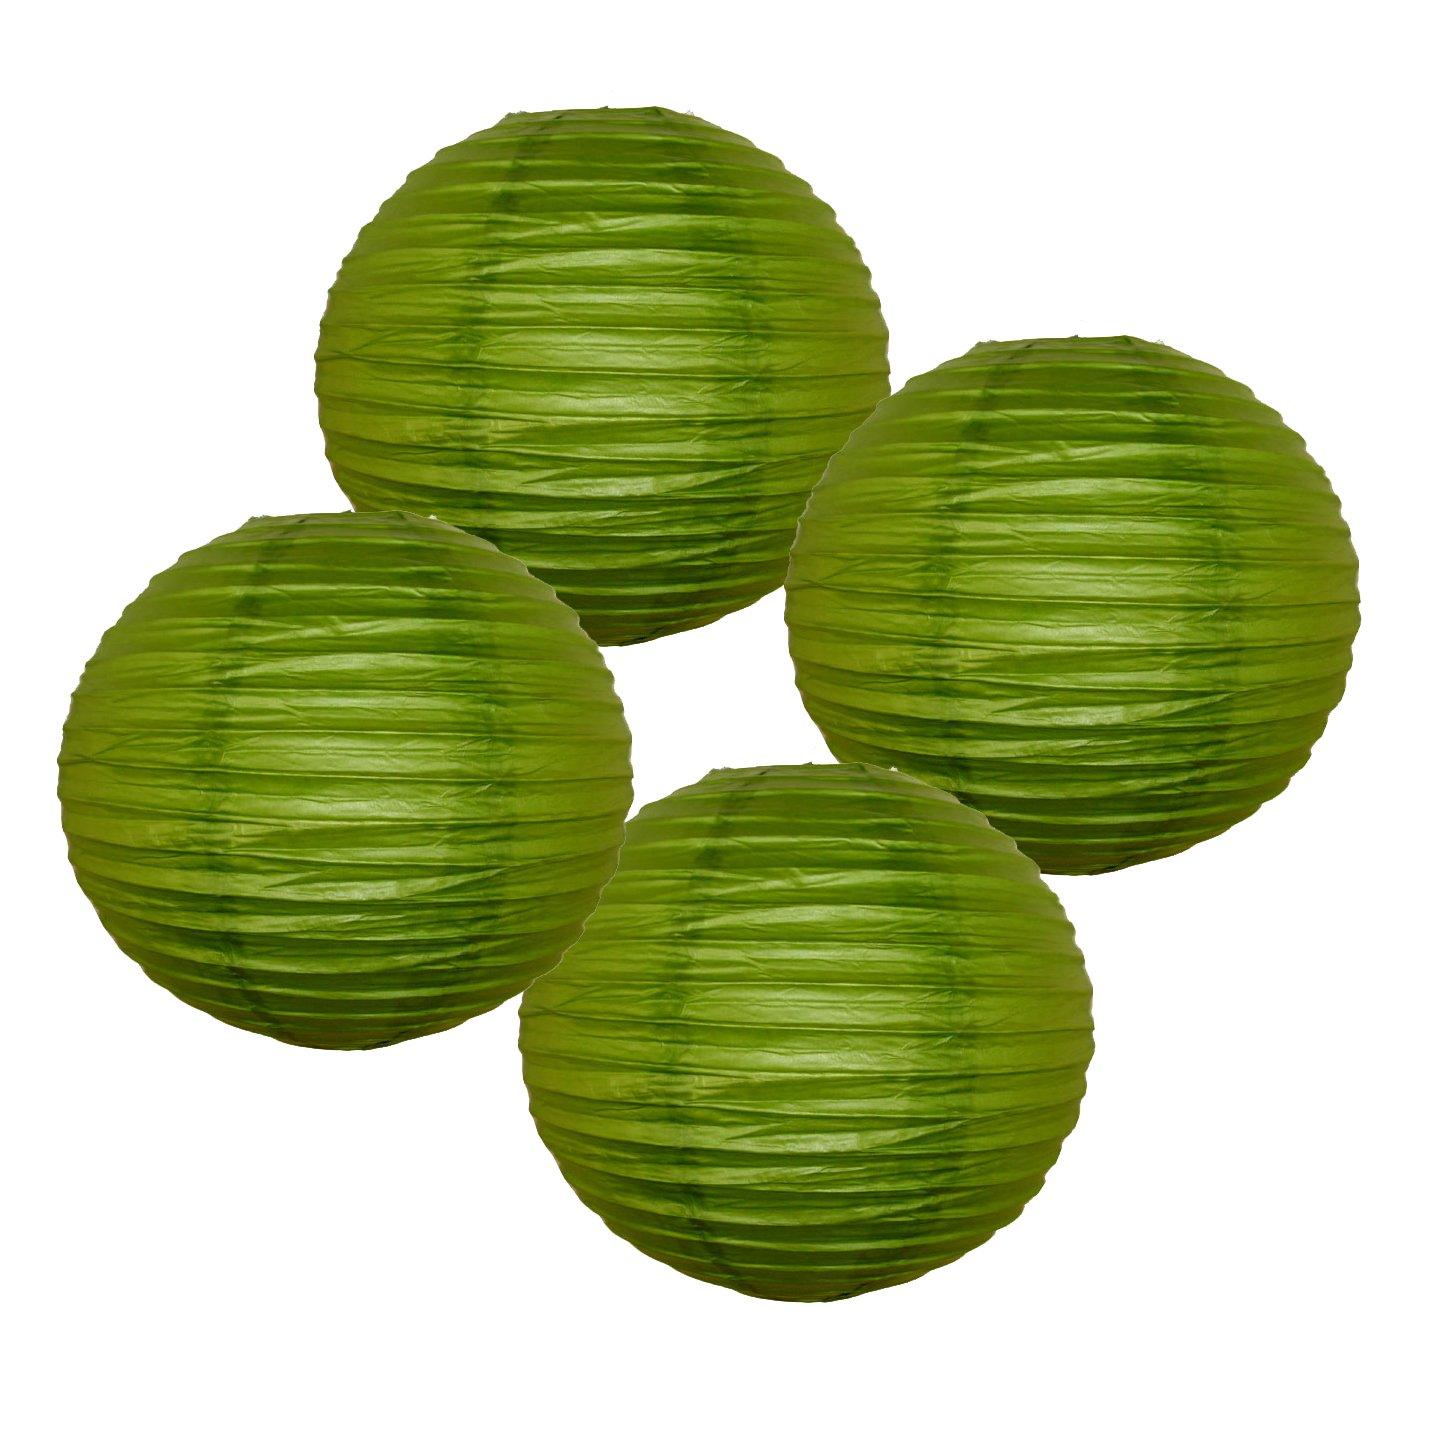 Just Artifacts 様々な紙製ランタン(色とサイズの異なる紙のランタン) 6inch AMZ-RPL4-060013 B01EGXJTW6 6inch|グラスグリーン グラスグリーン 6inch